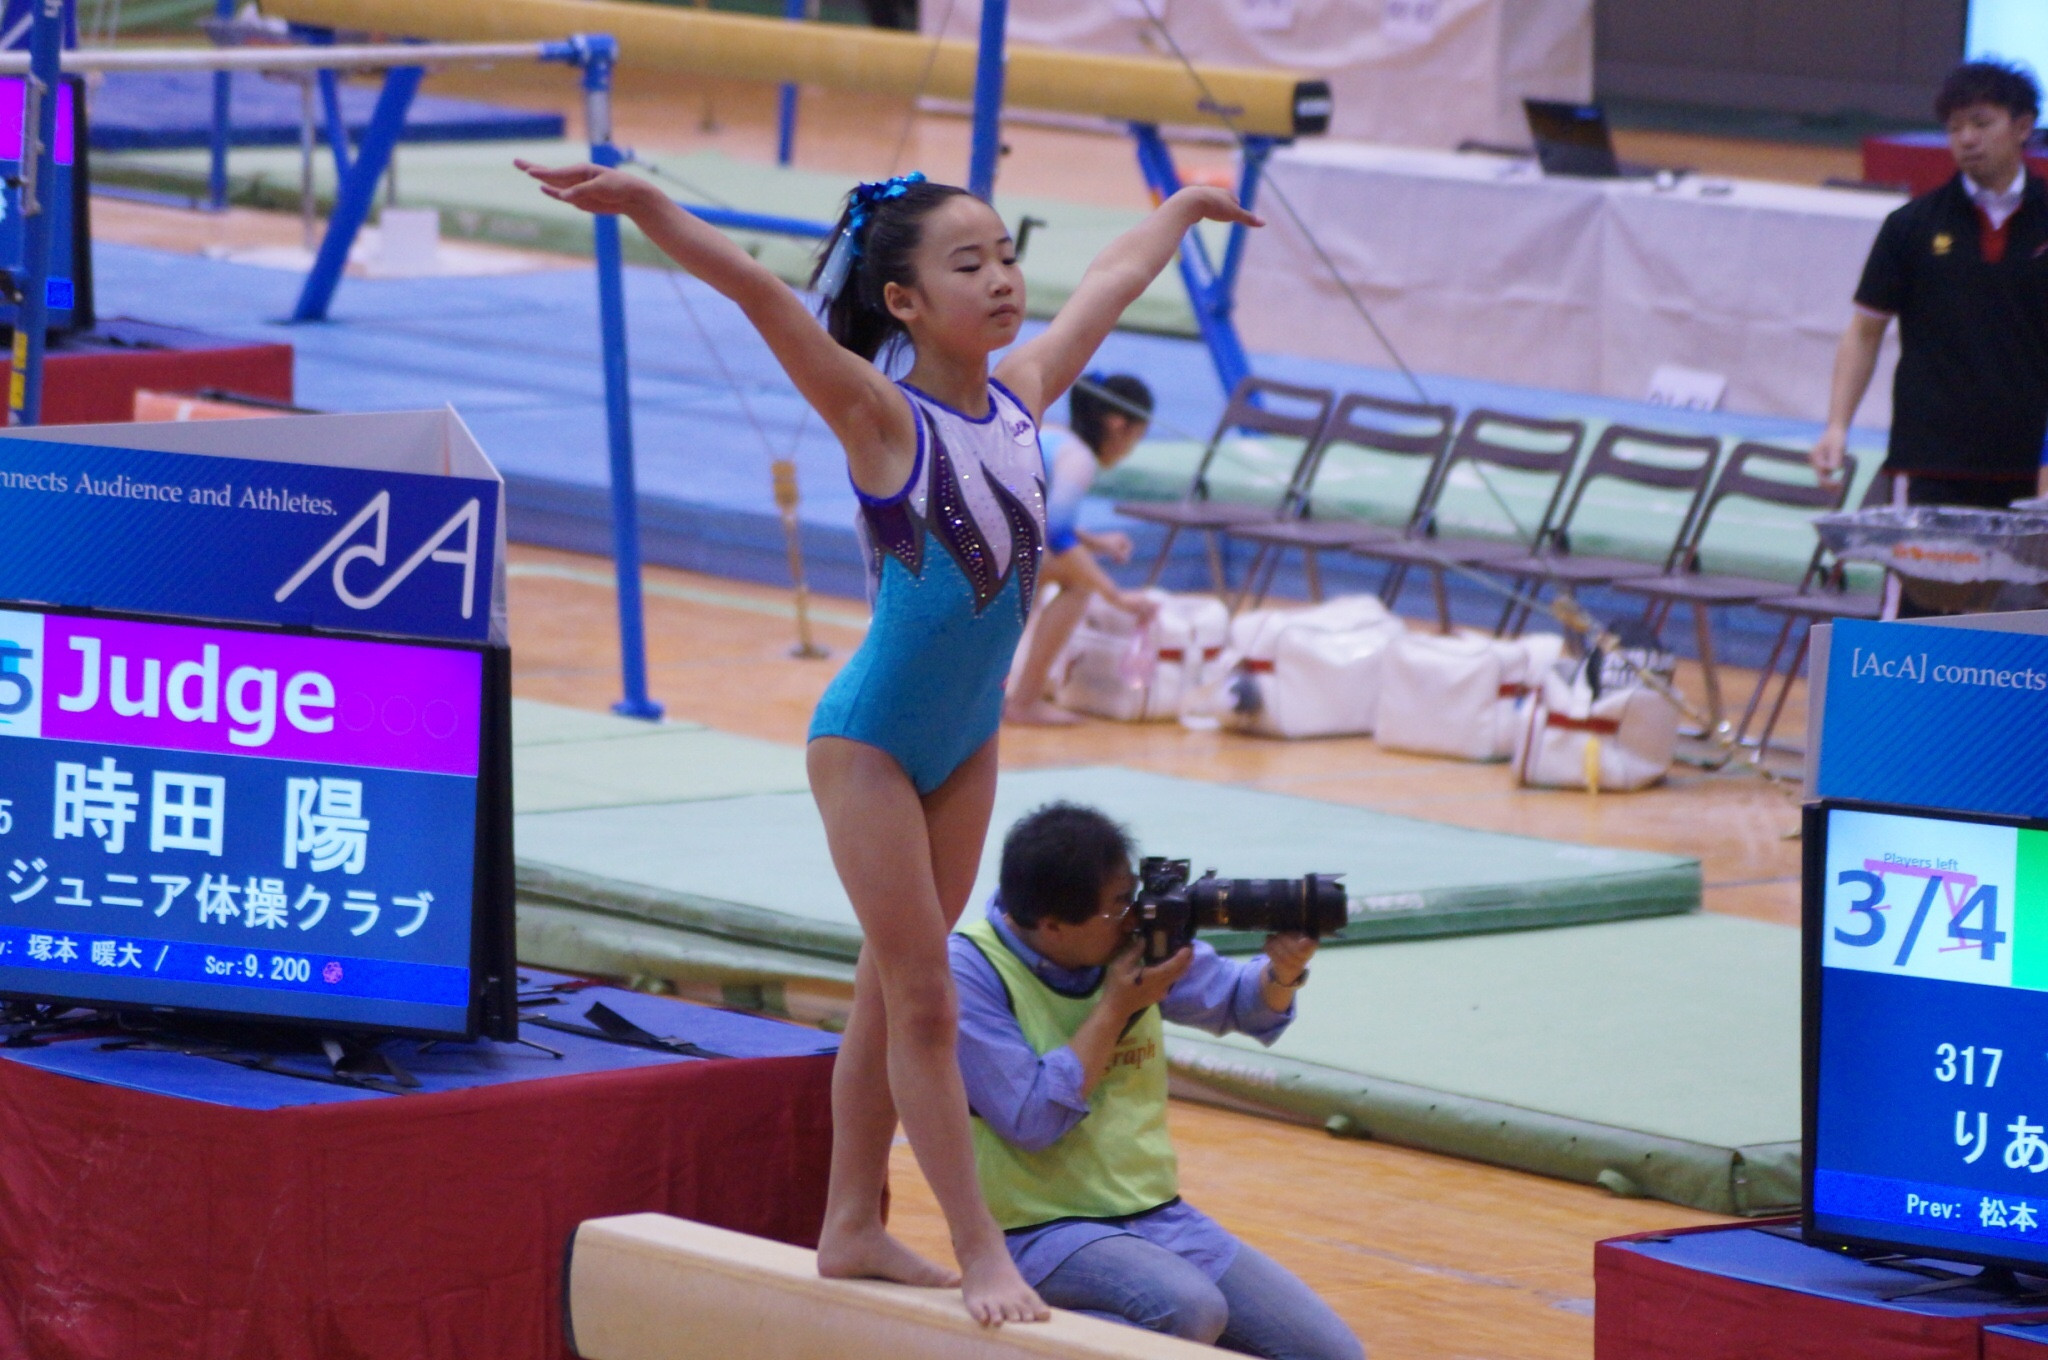 2019年AJG大会in三重県画像22